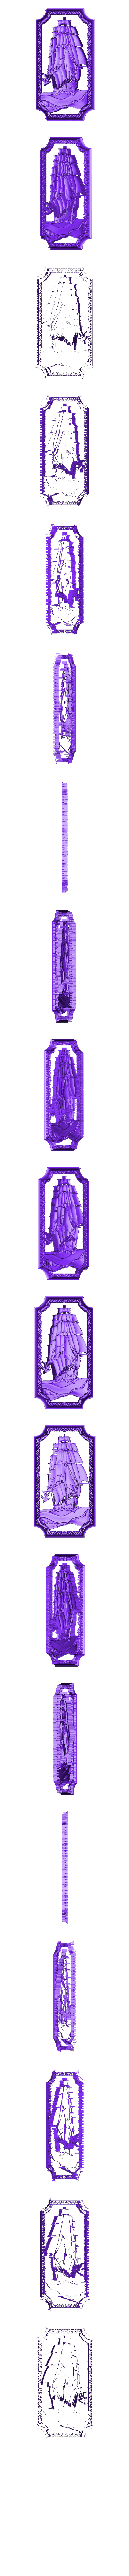 Ship.stl Download free STL file Sail Ship • Design to 3D print, Account-Closed